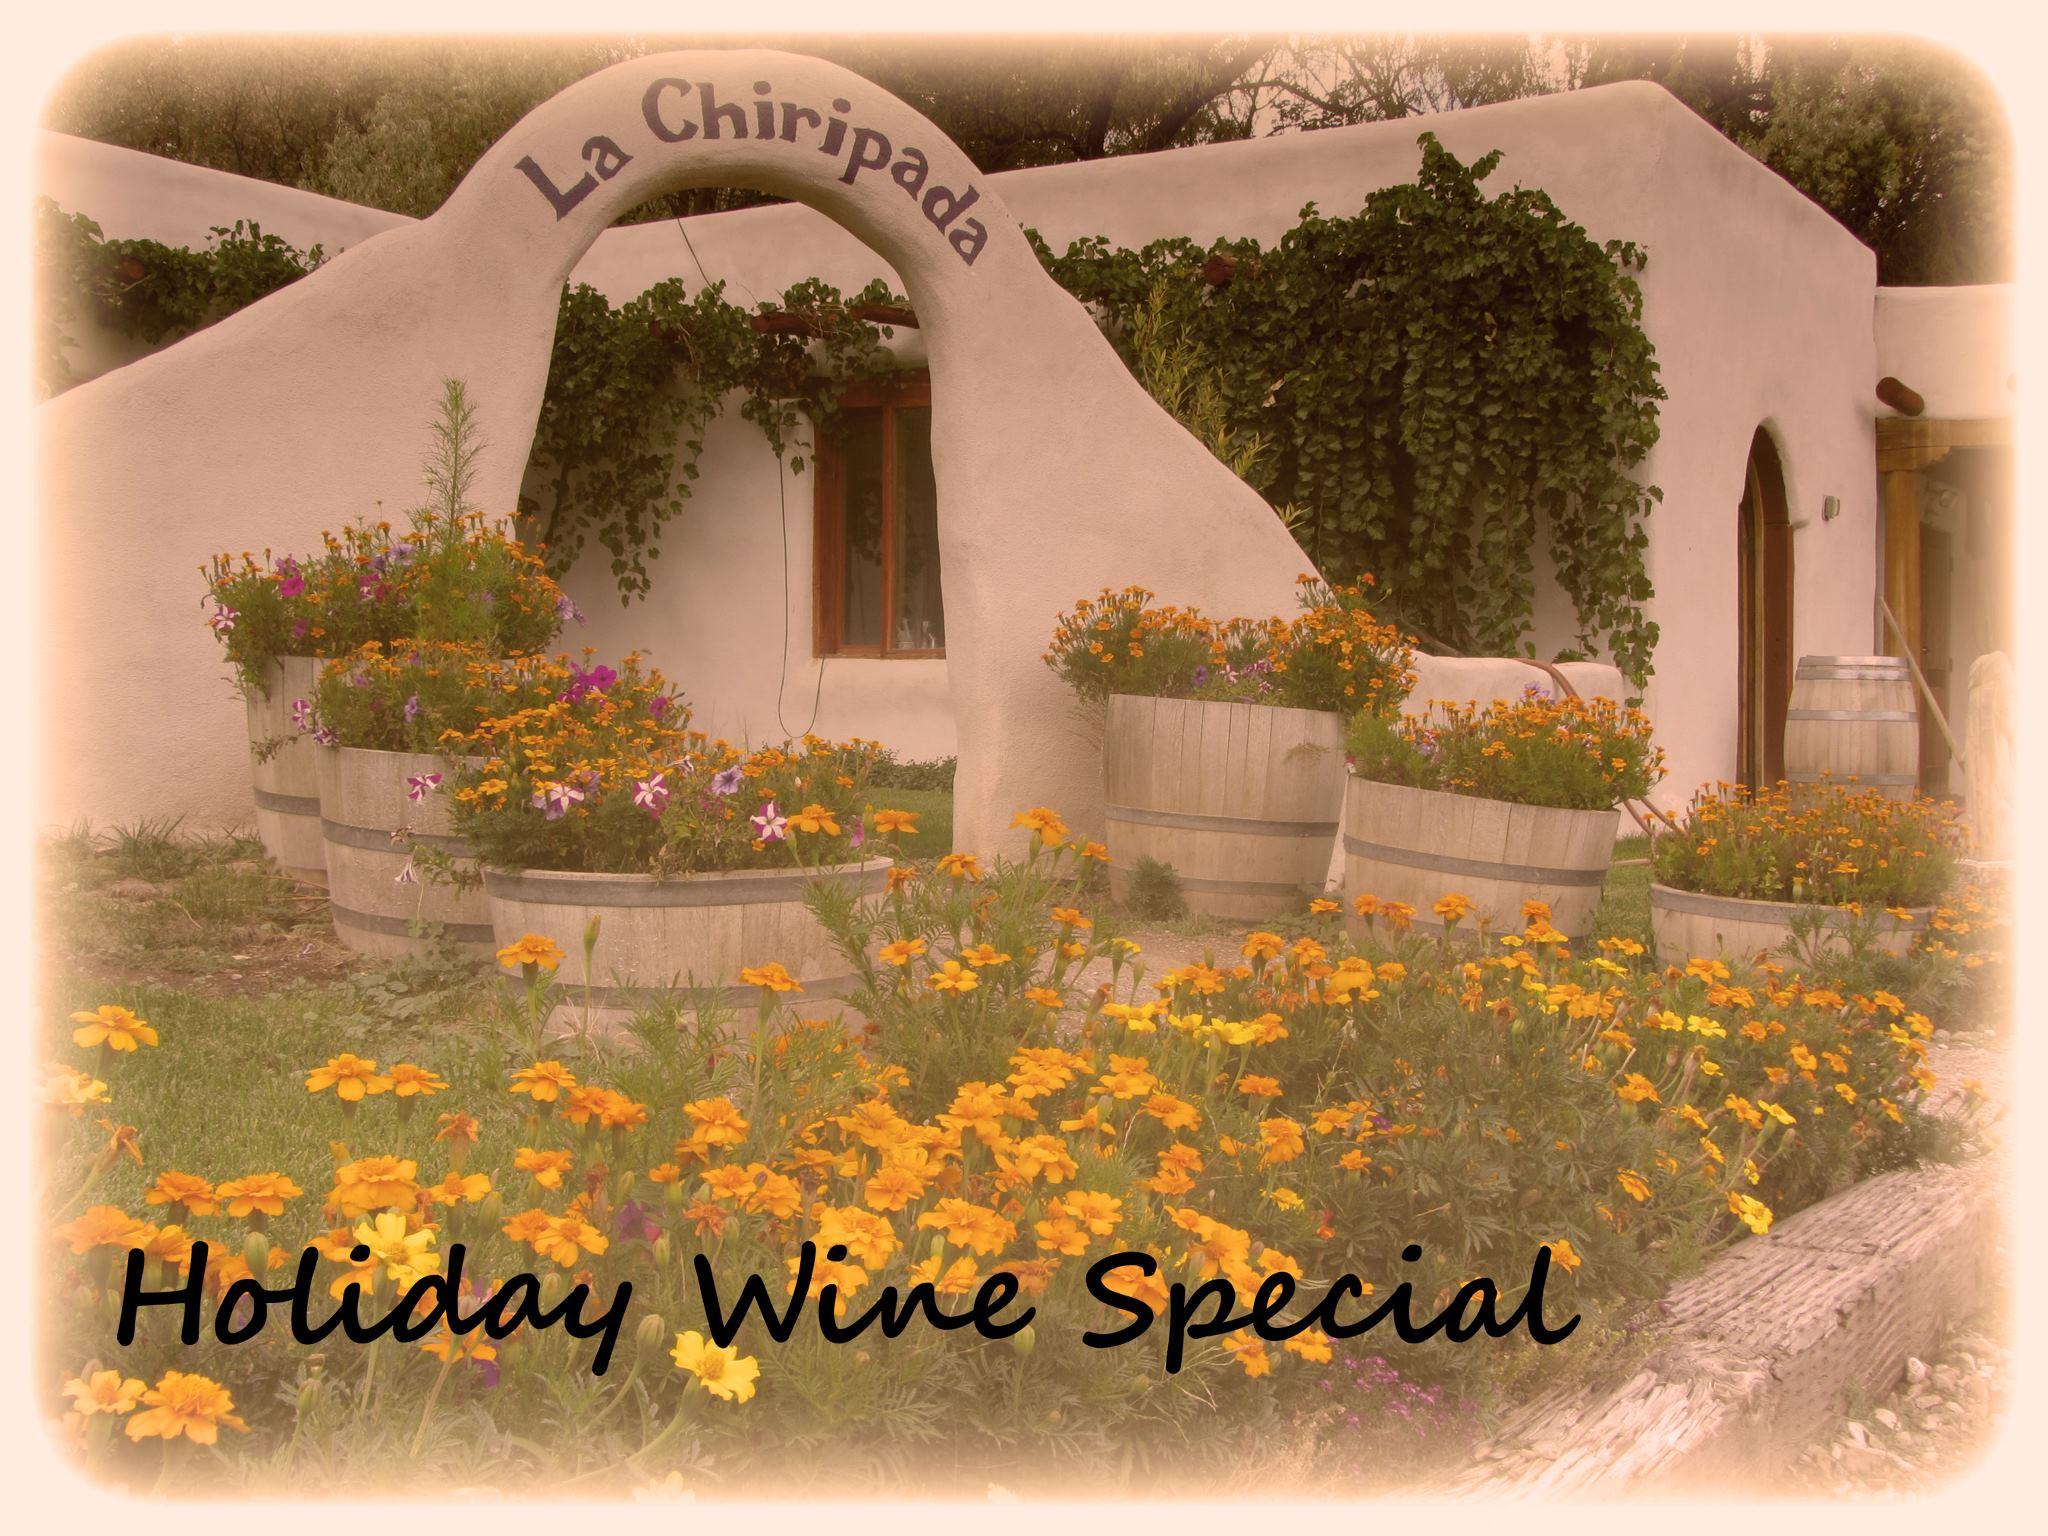 La Chiripada Winery